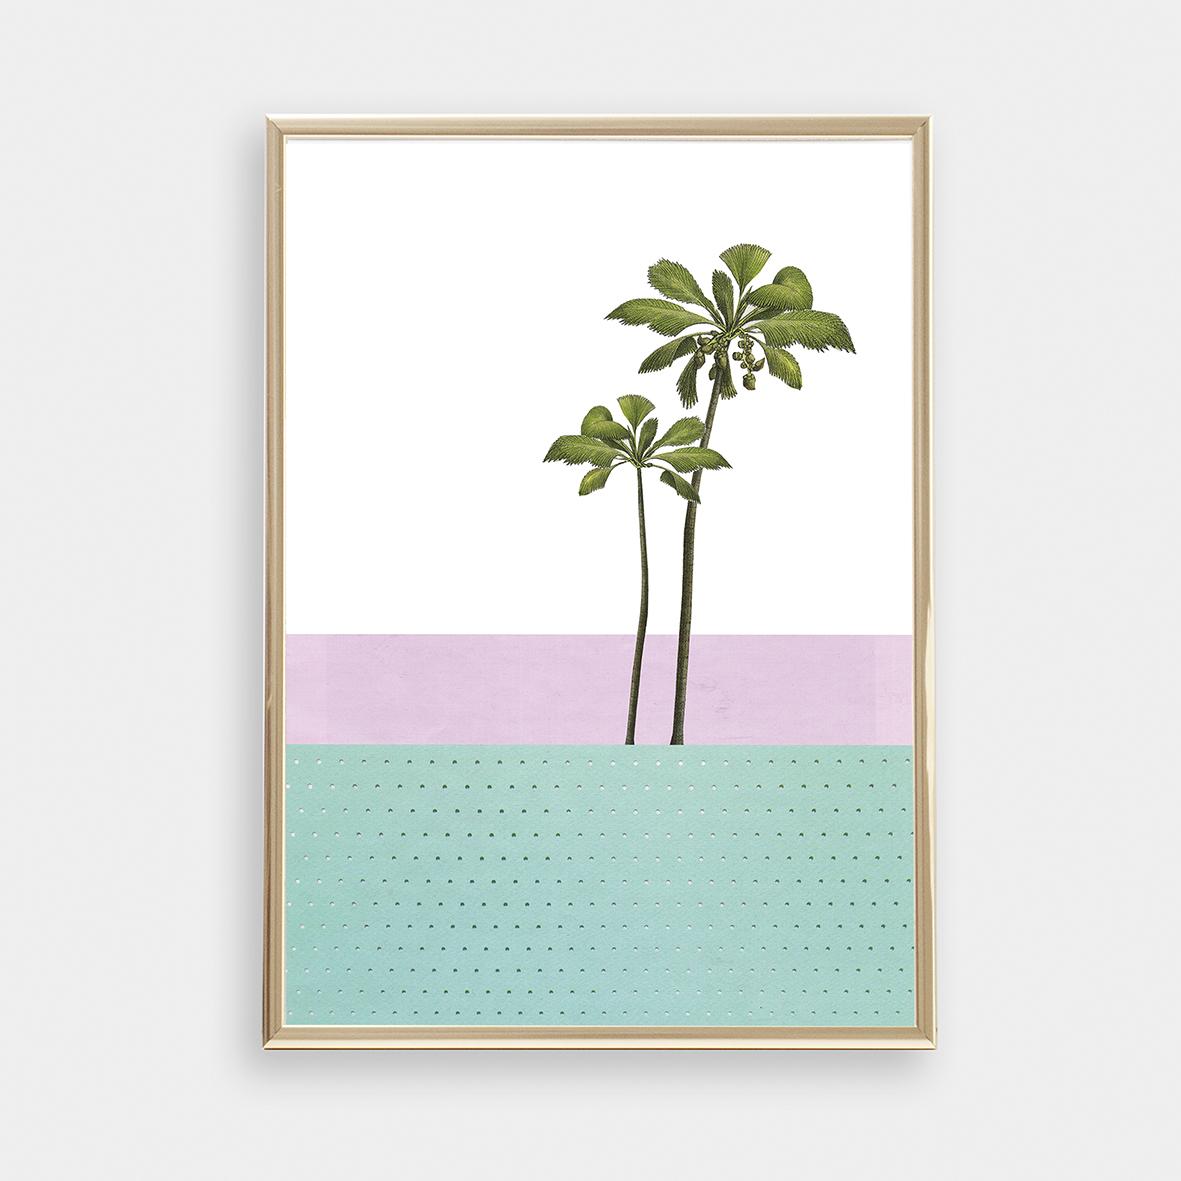 Palme 01 / Kunstdruck / Fine Art Print / Poster / Plakat